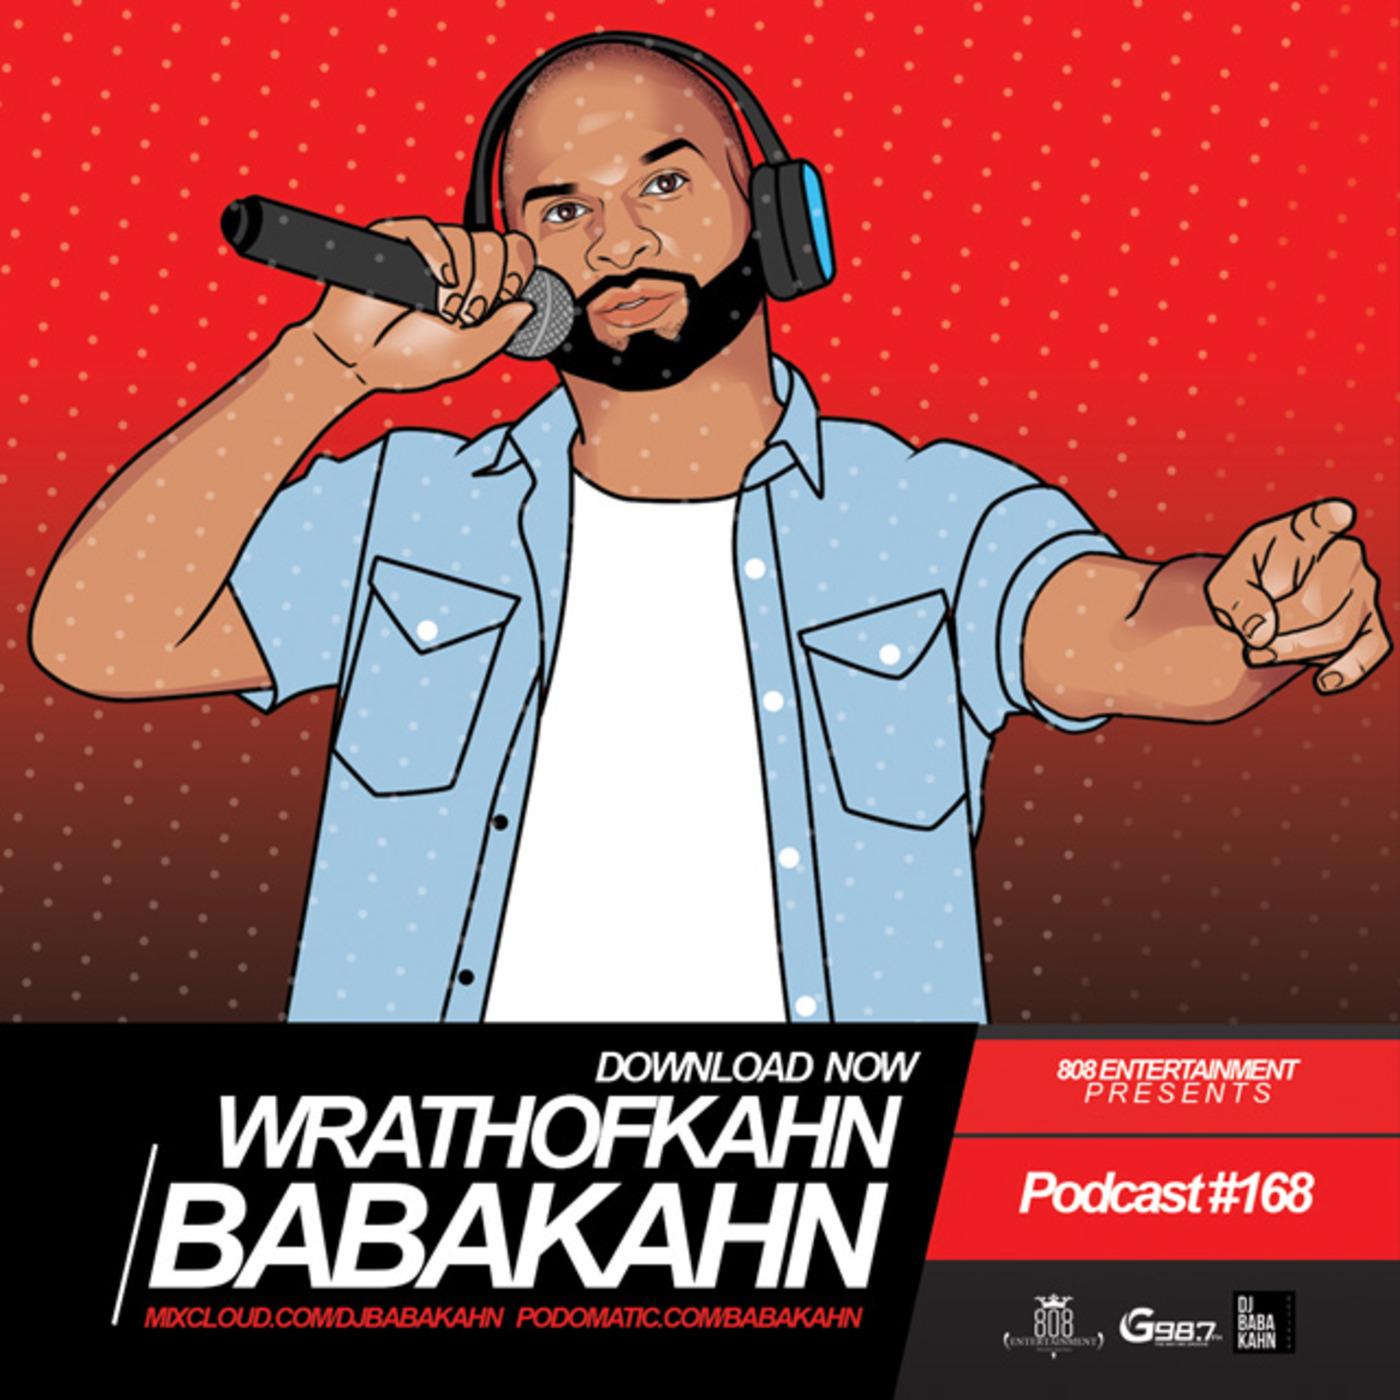 Wrath Of Kahn DJ Mix 168 DJ BABA KAHN podcast